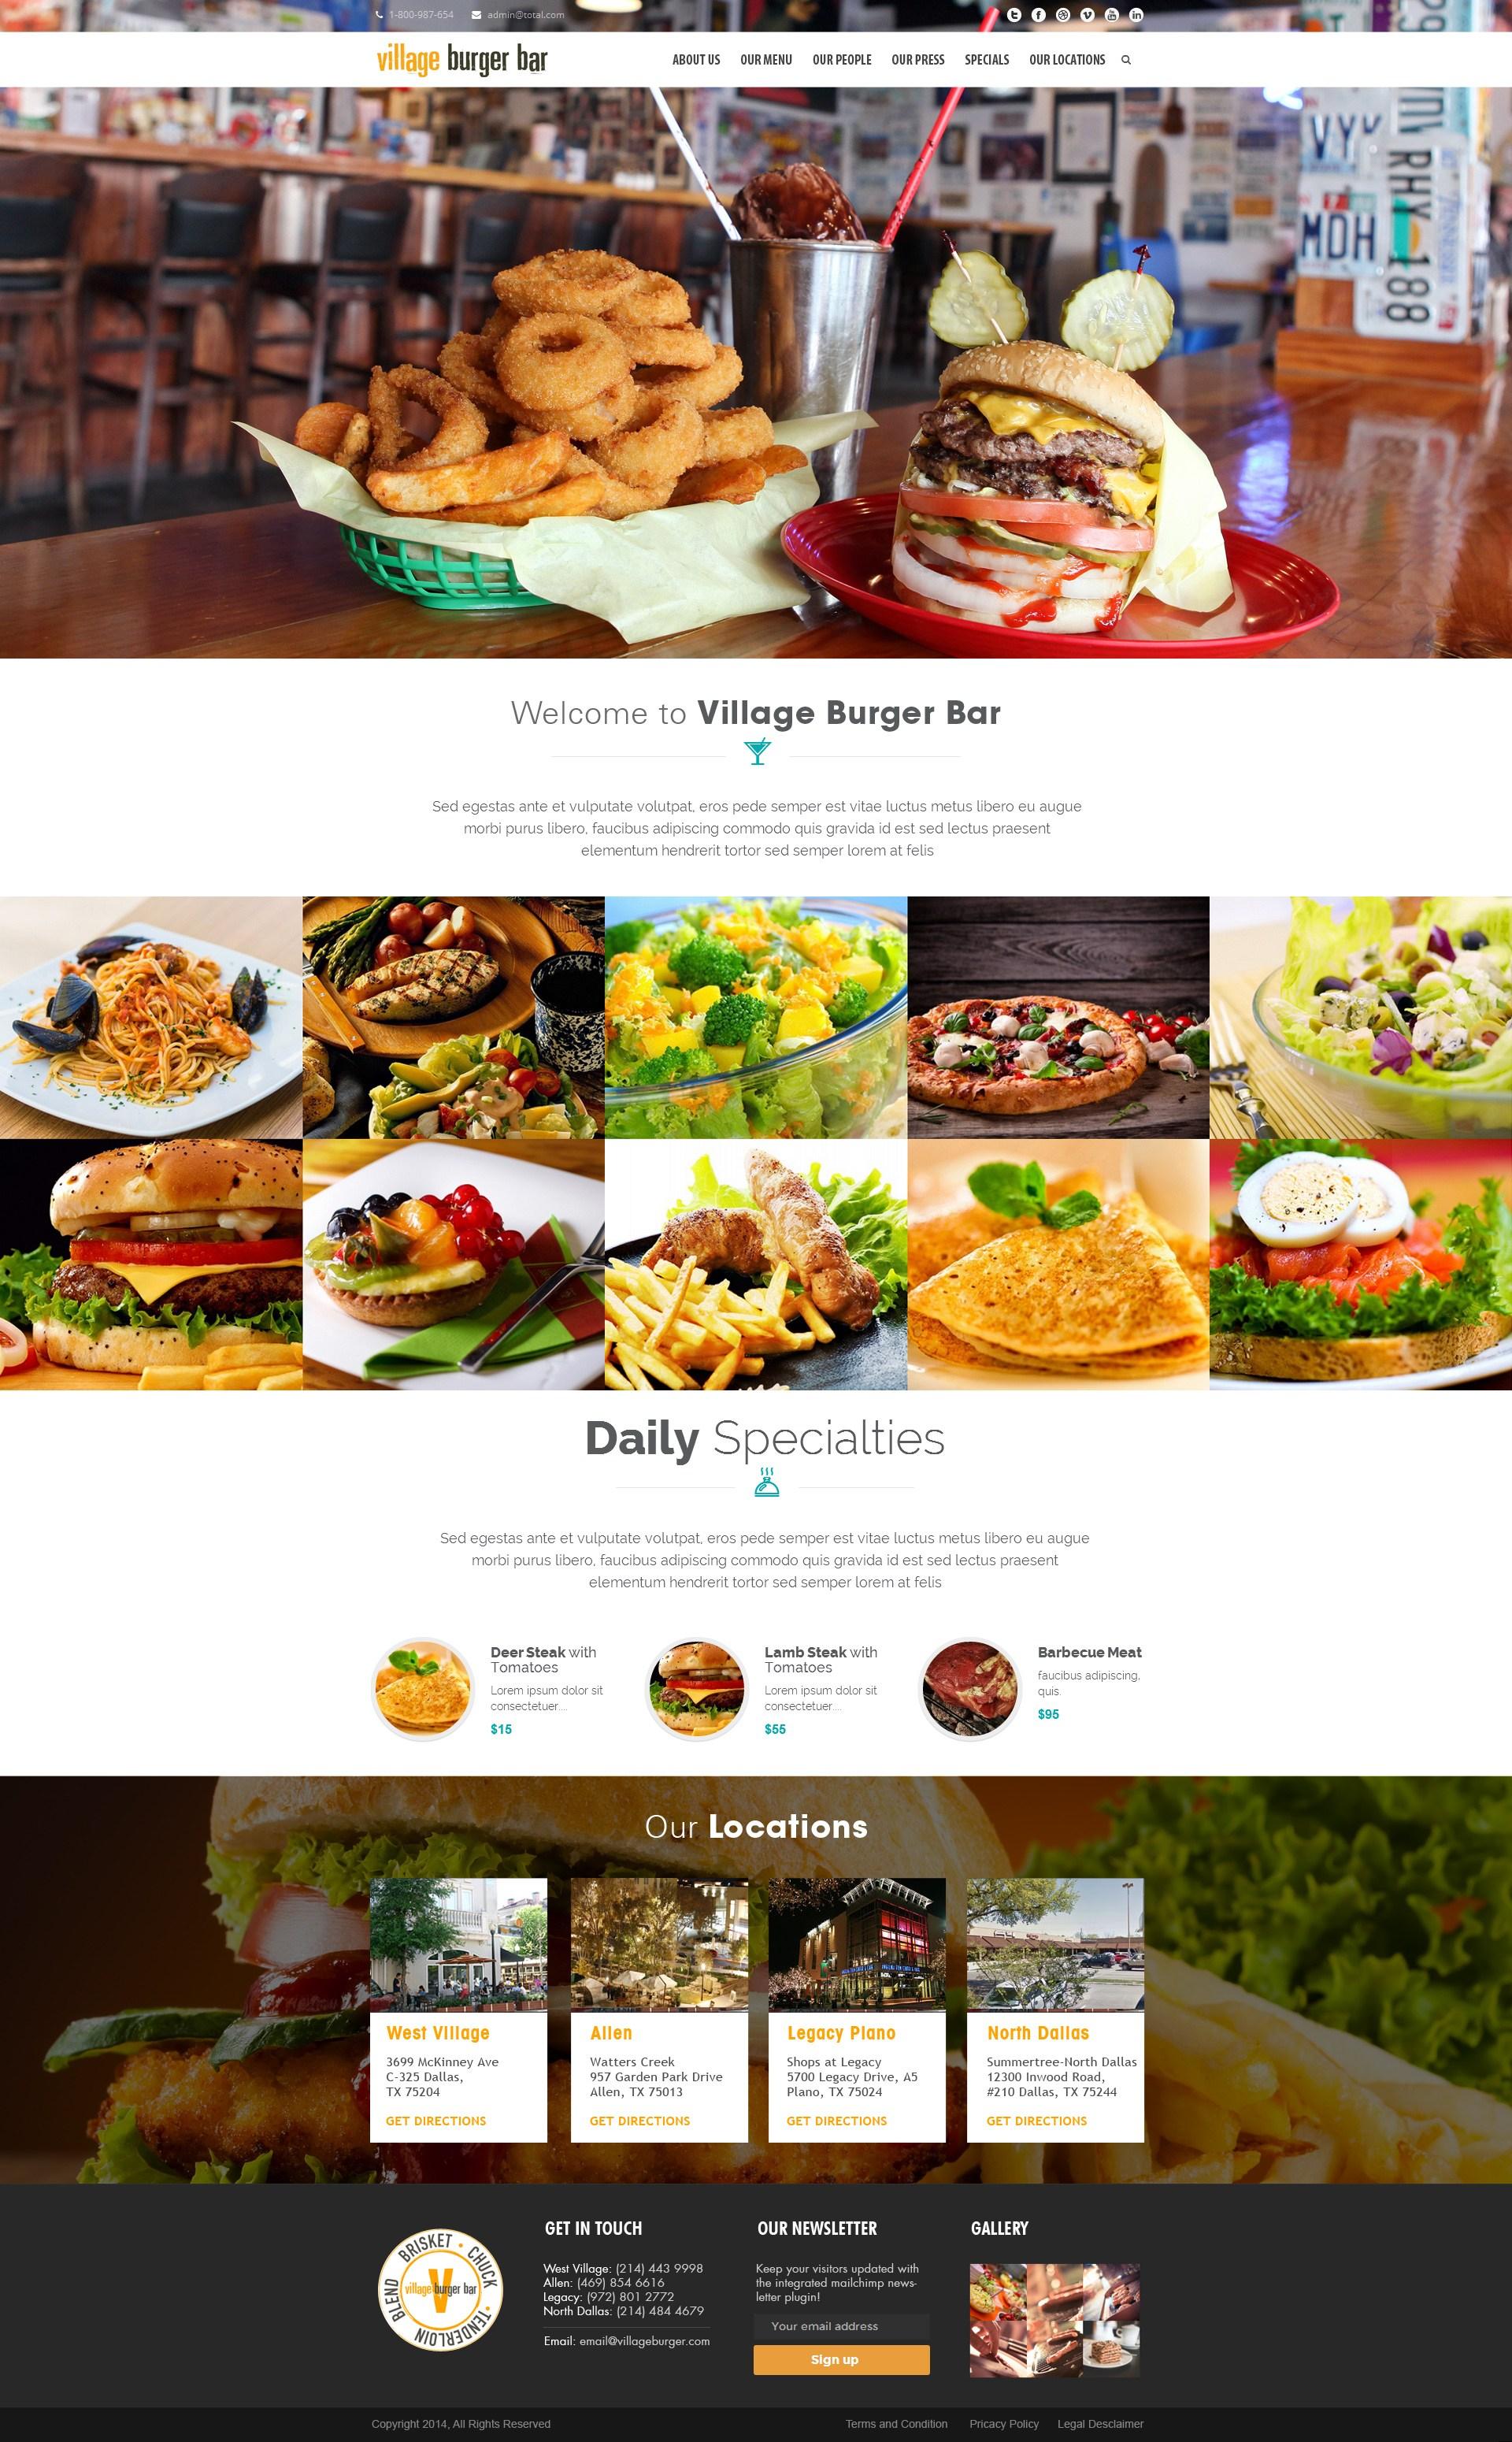 Village Burger Bar